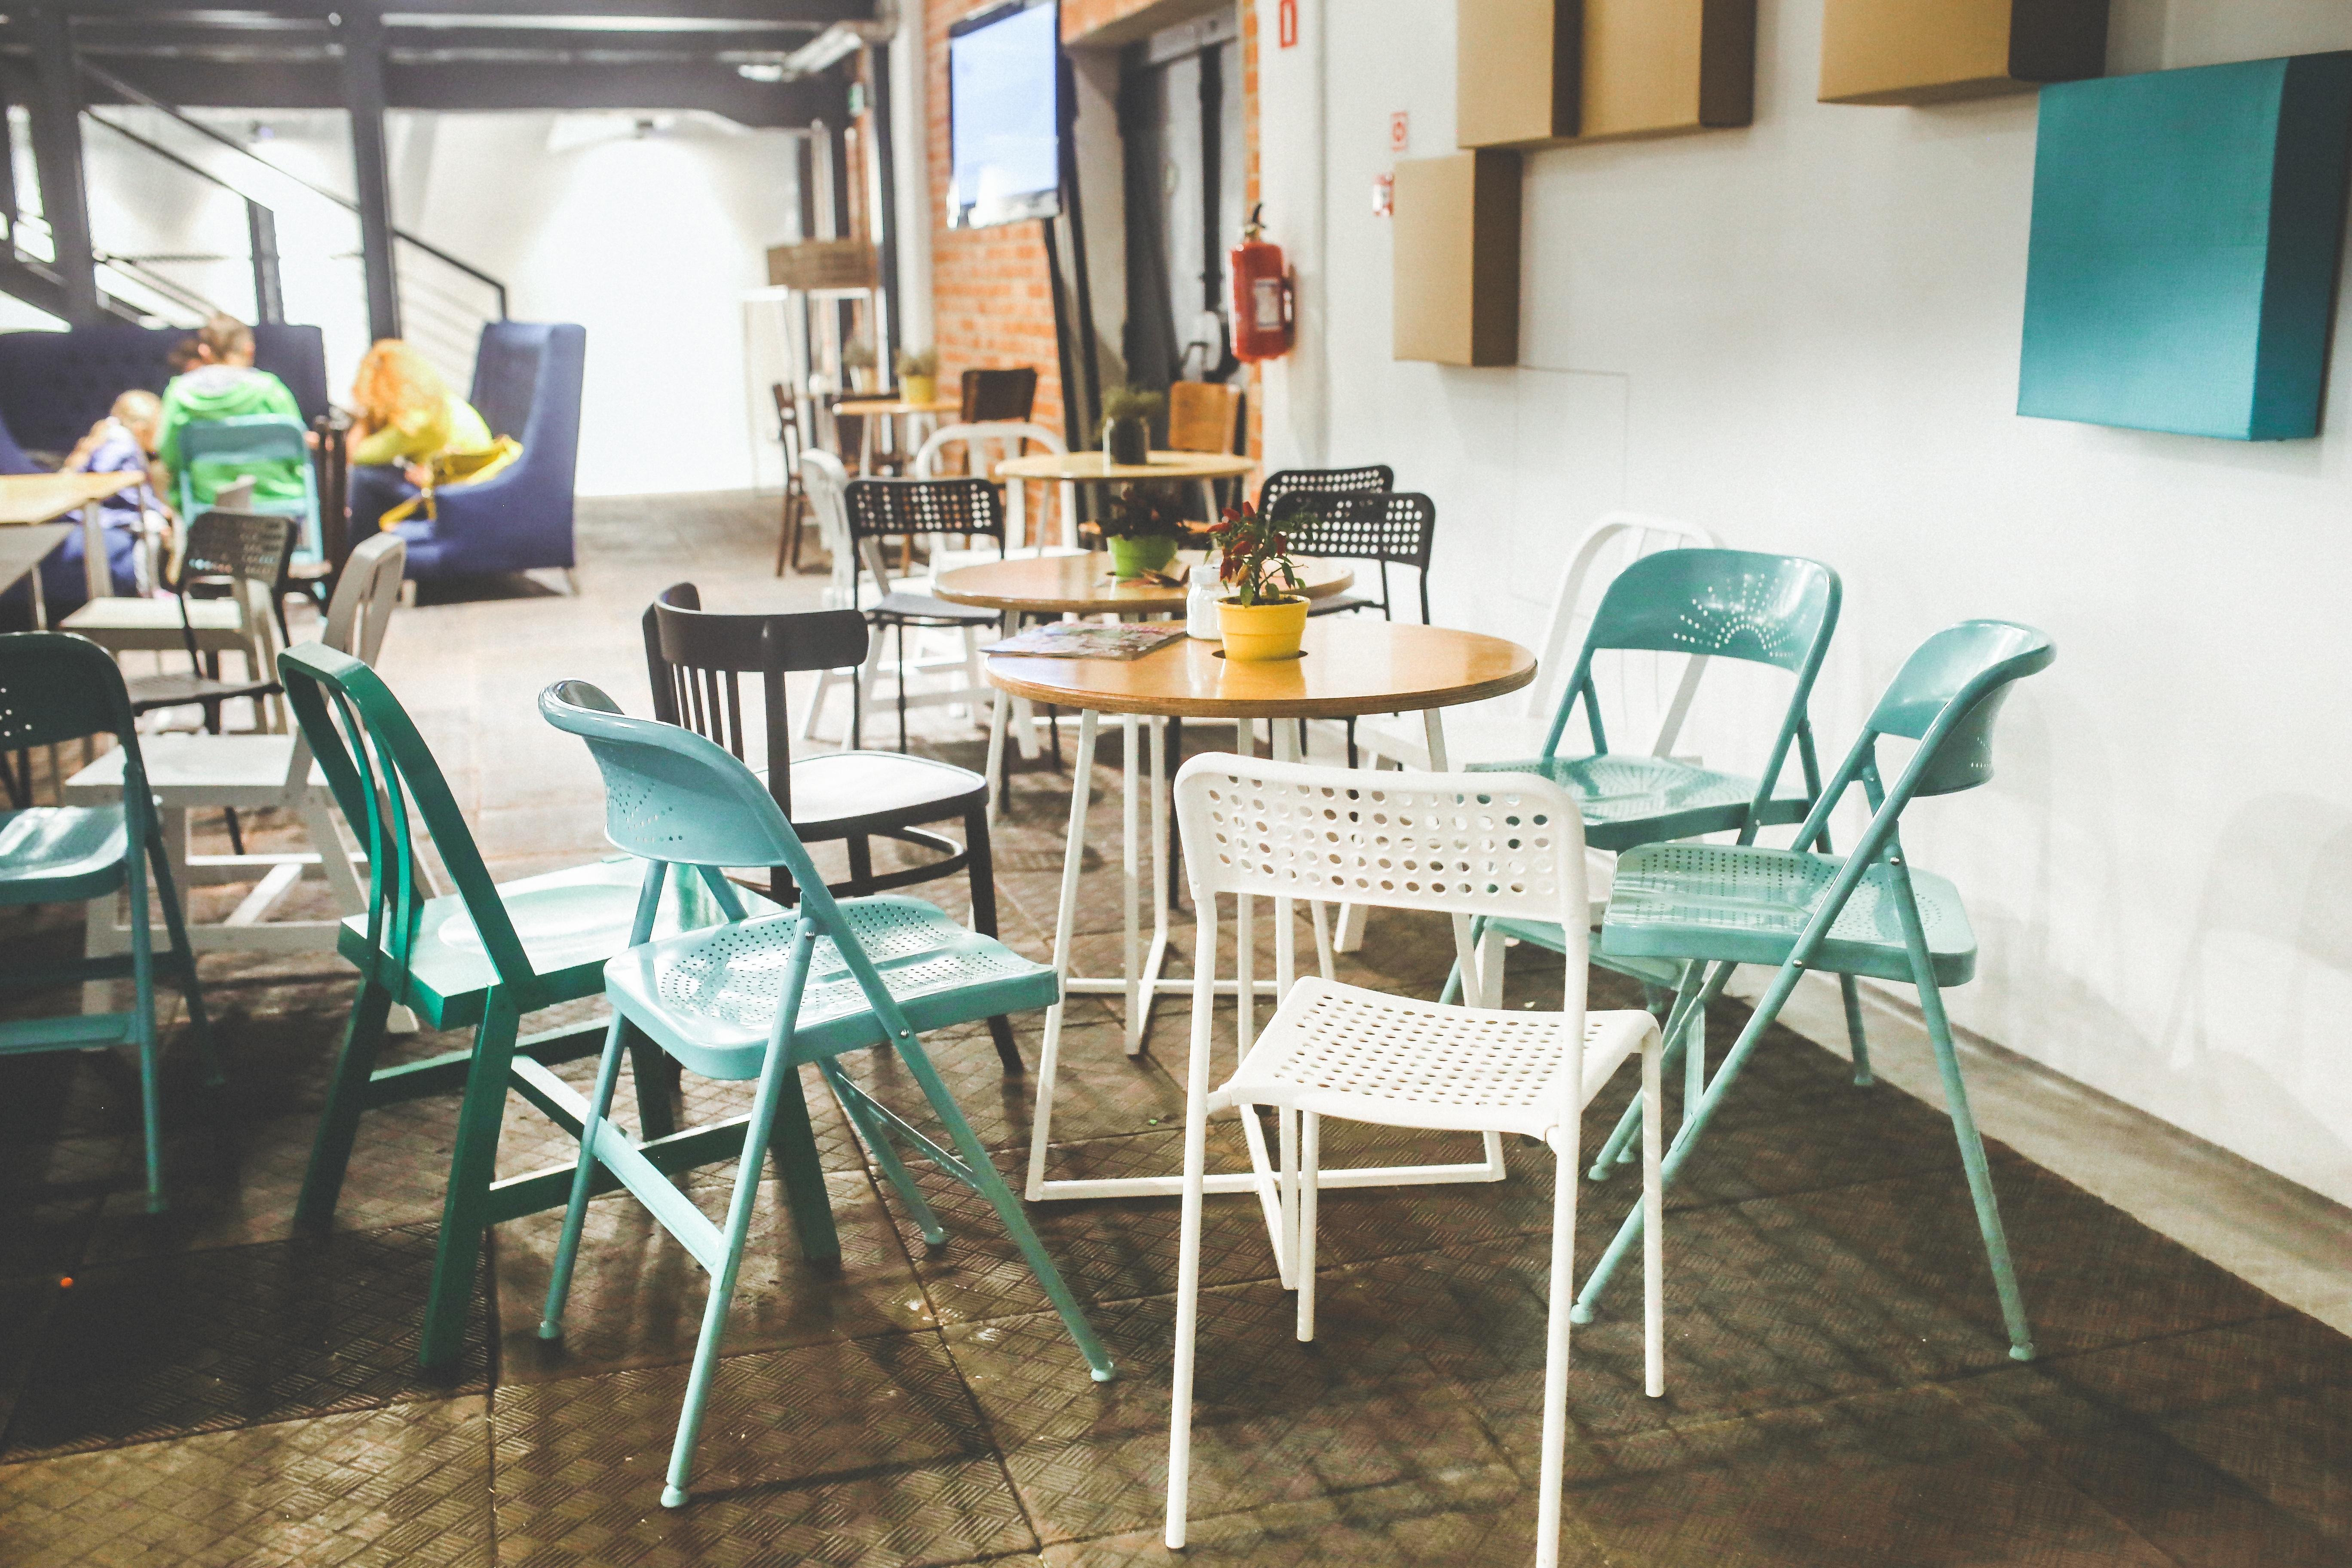 https://get.pxhere.com/photo/table-vintage-retro-interior-restaurant-old-property-furniture-room-interior-design-design-stylish-dining-room-industial-722972.jpg